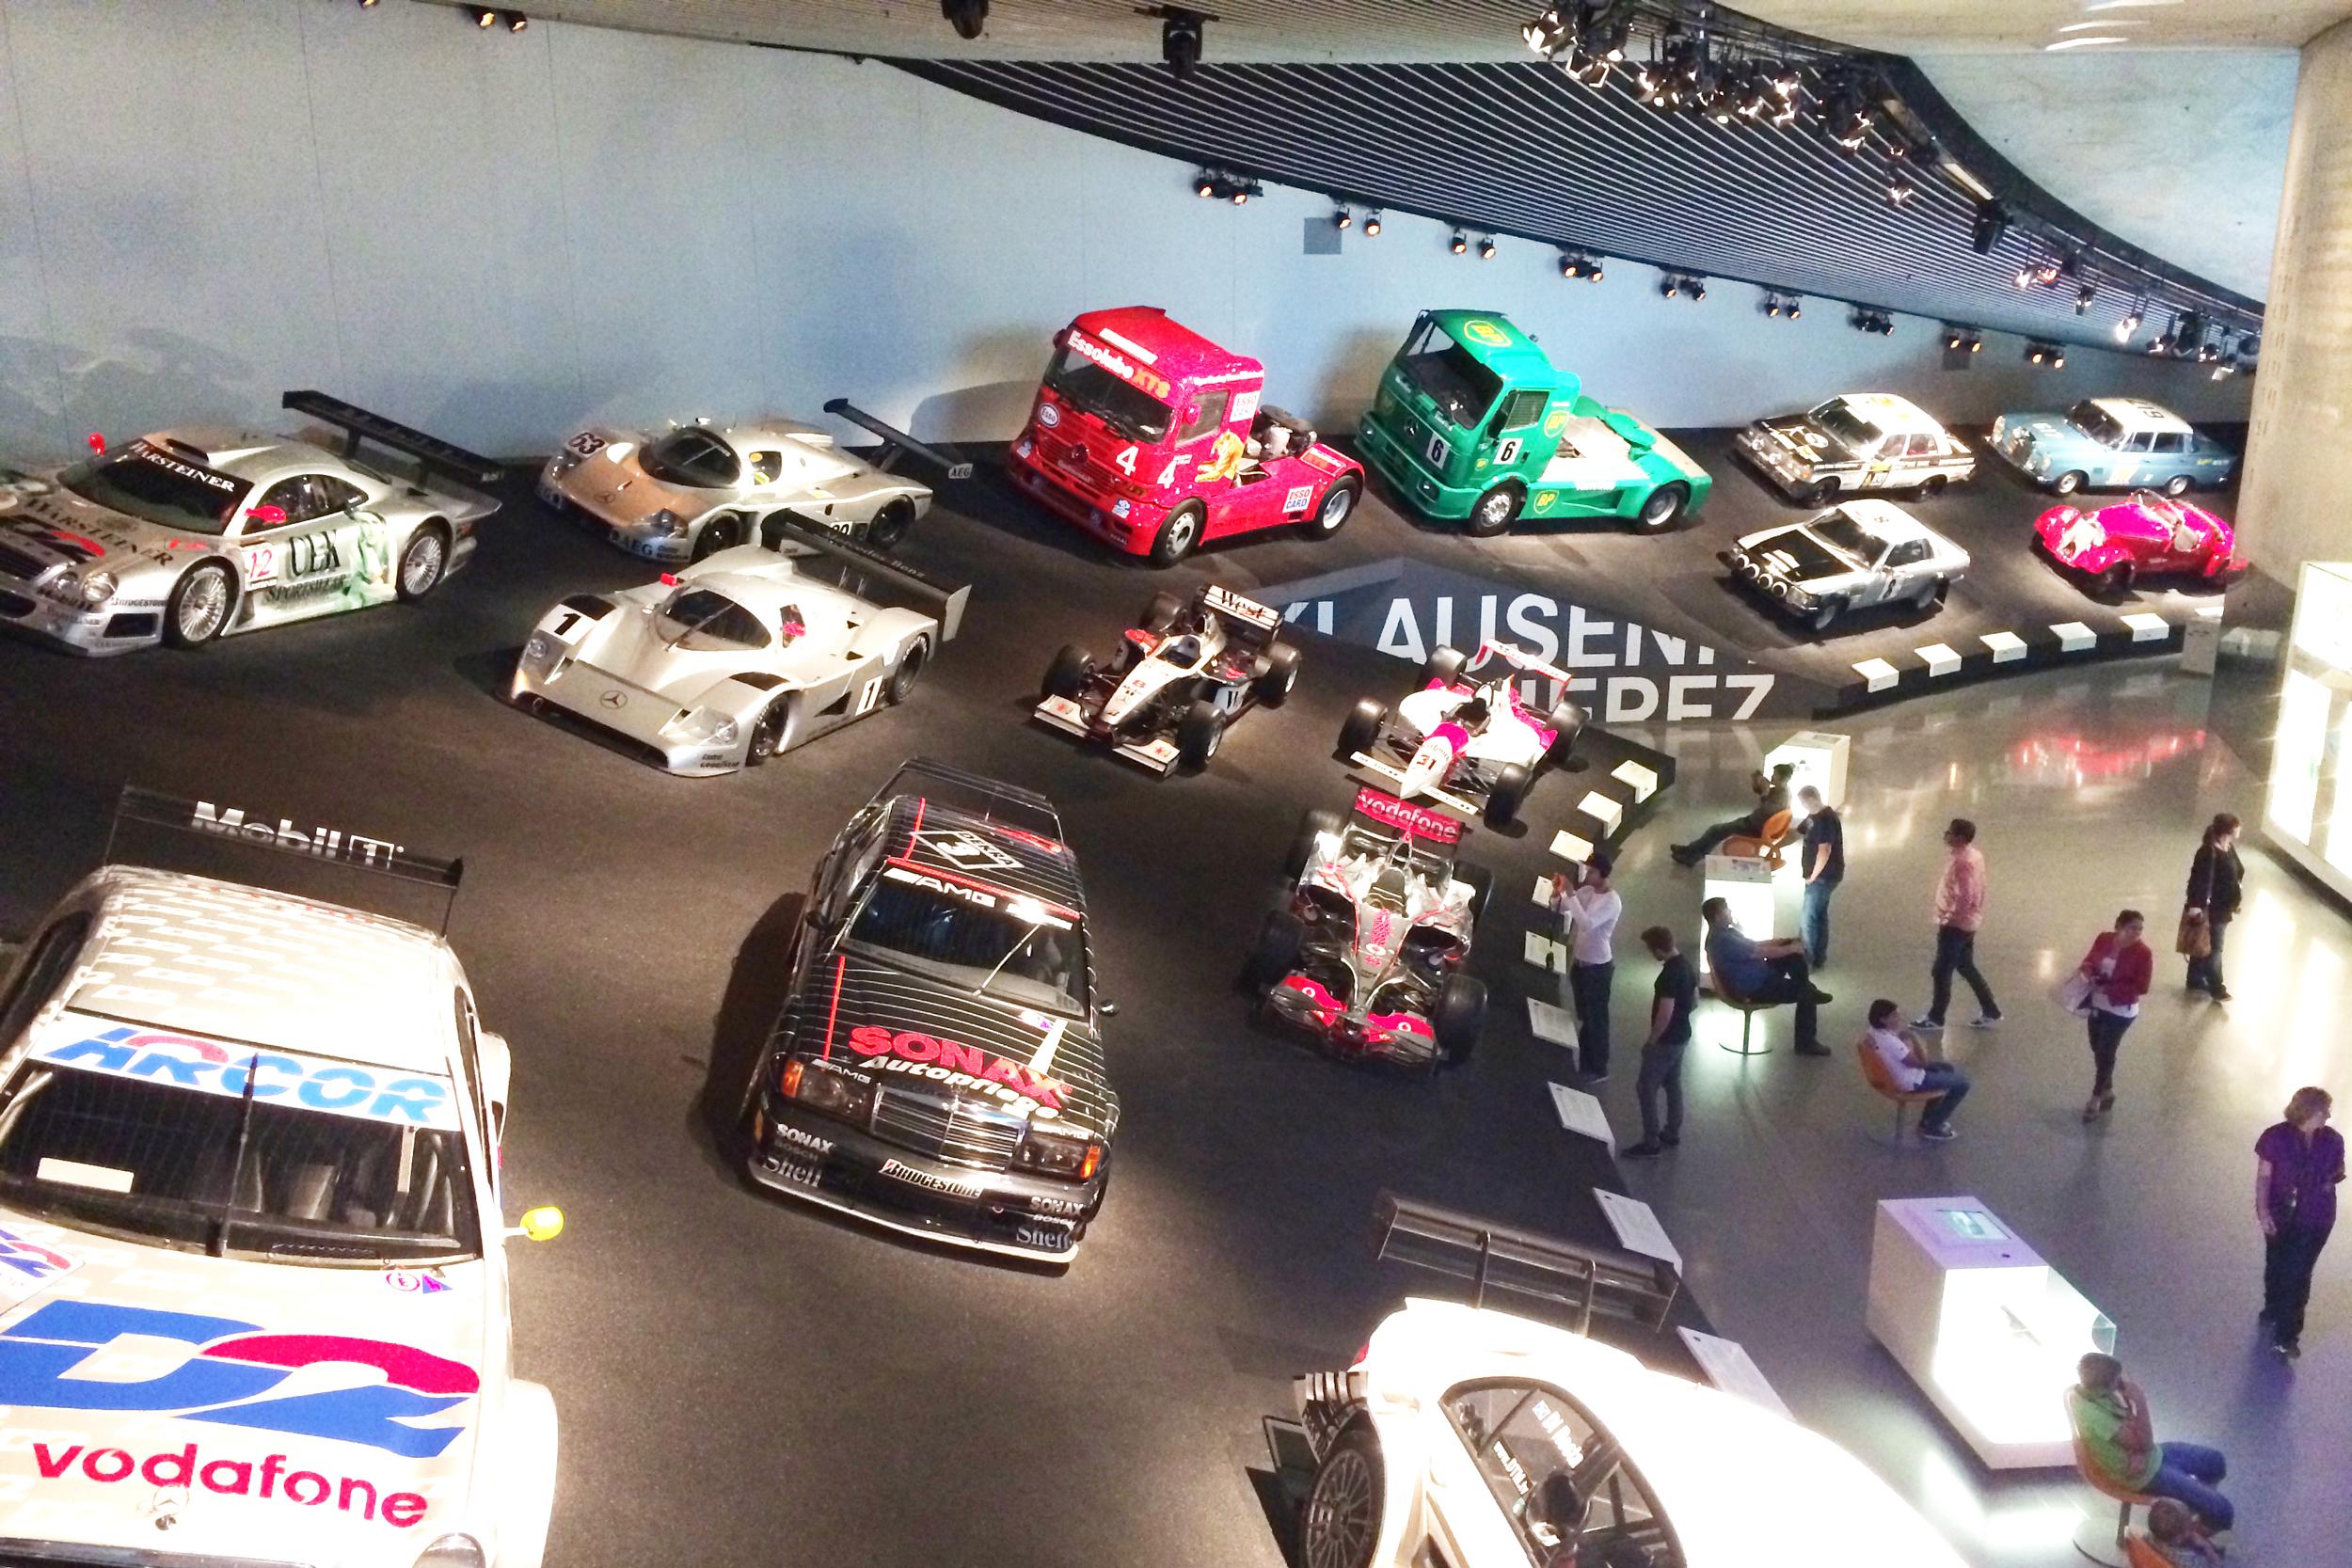 Race cars... and a few race trucks, too!